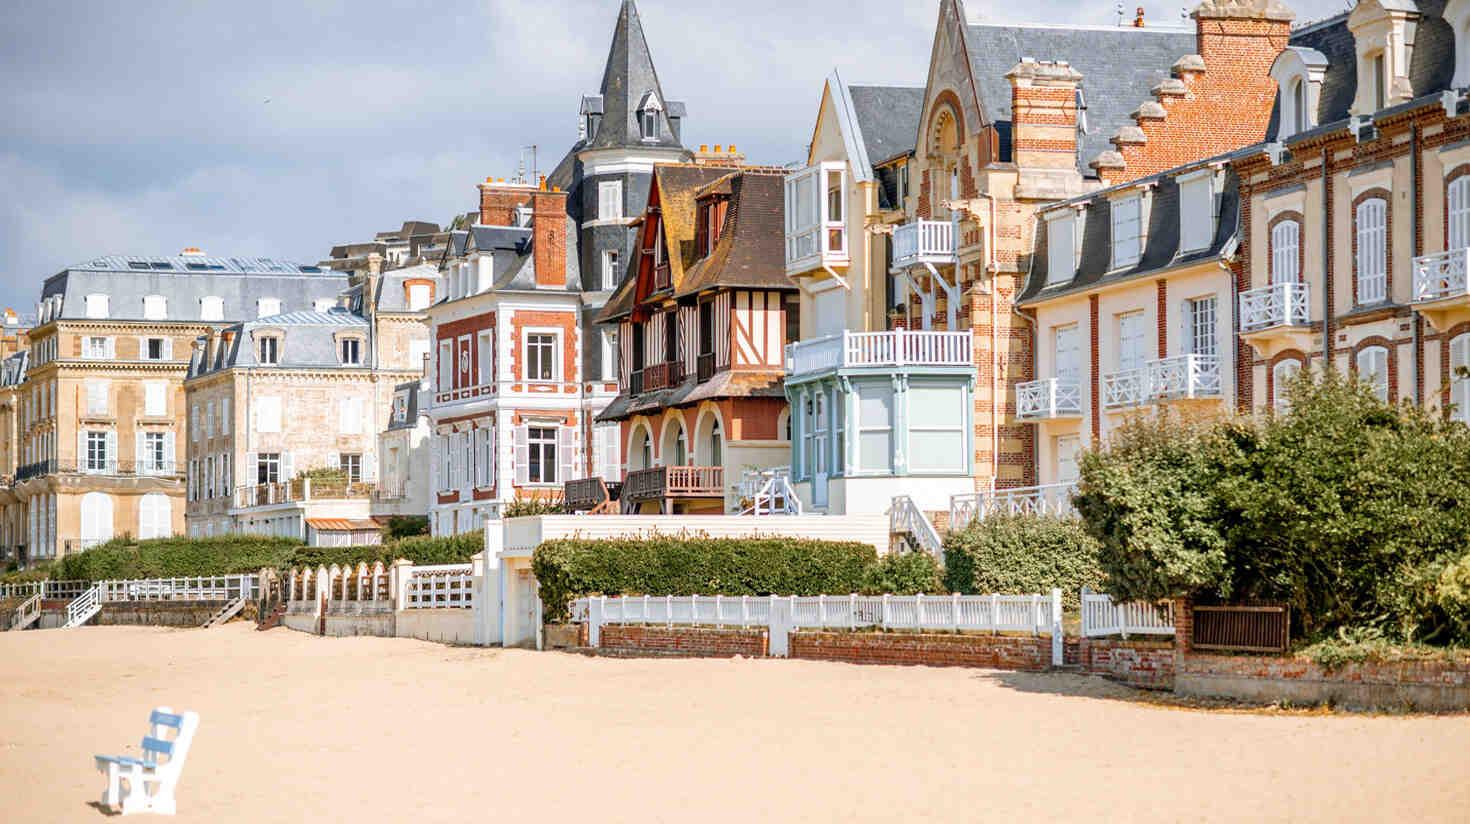 Où est-ce que j'habite en Normandie?